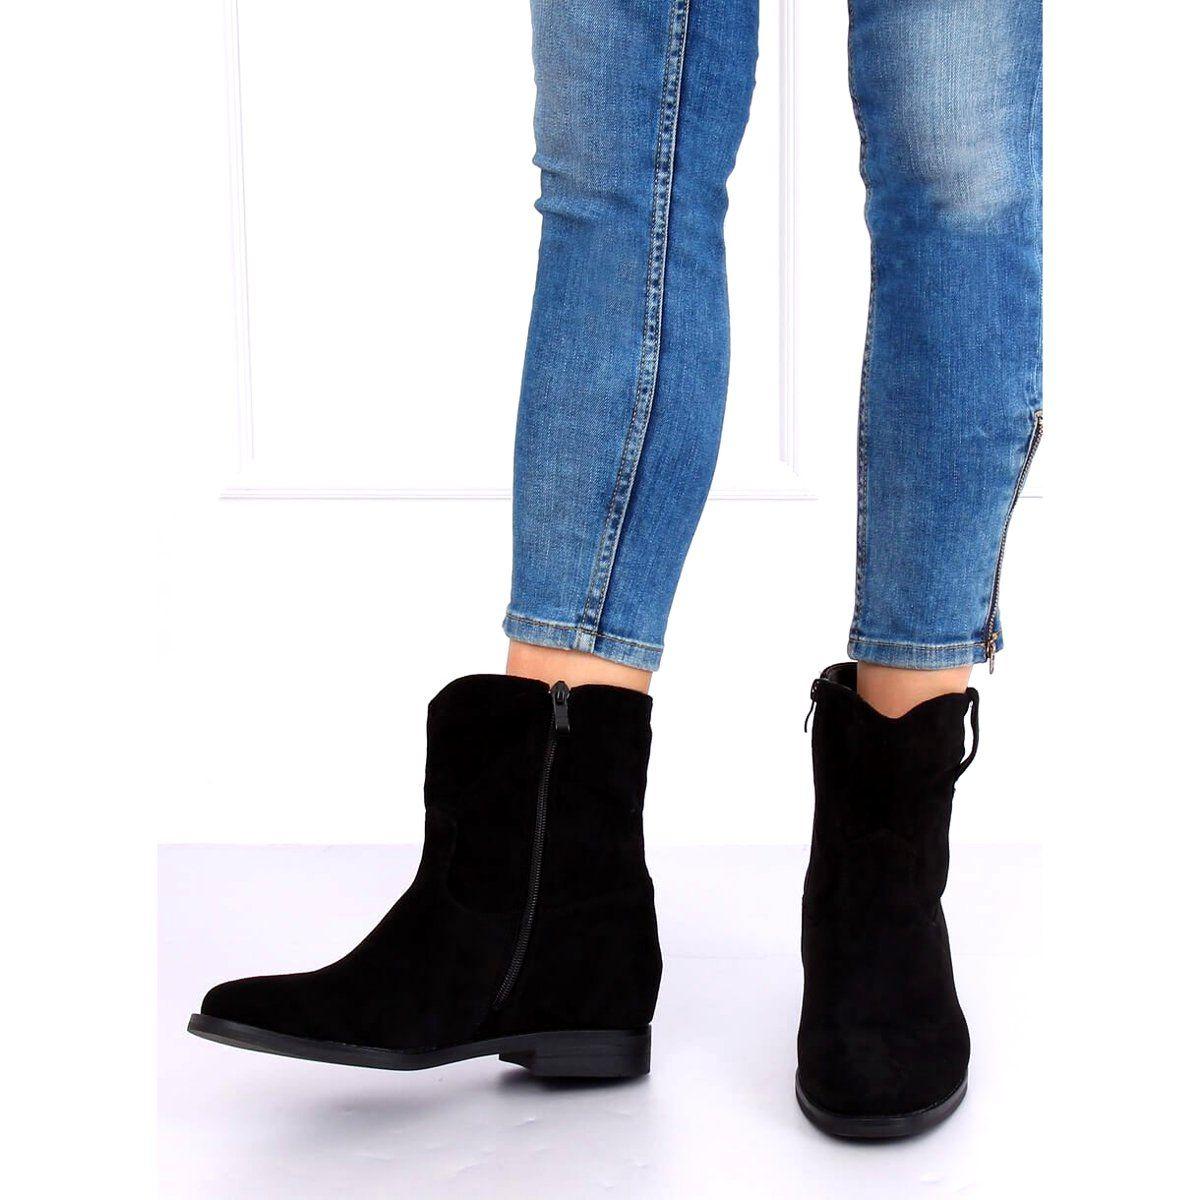 Botki Na Ukrytym Koturnie Czarne Nc980 Black Boots Black Boots Boot Shoes Women